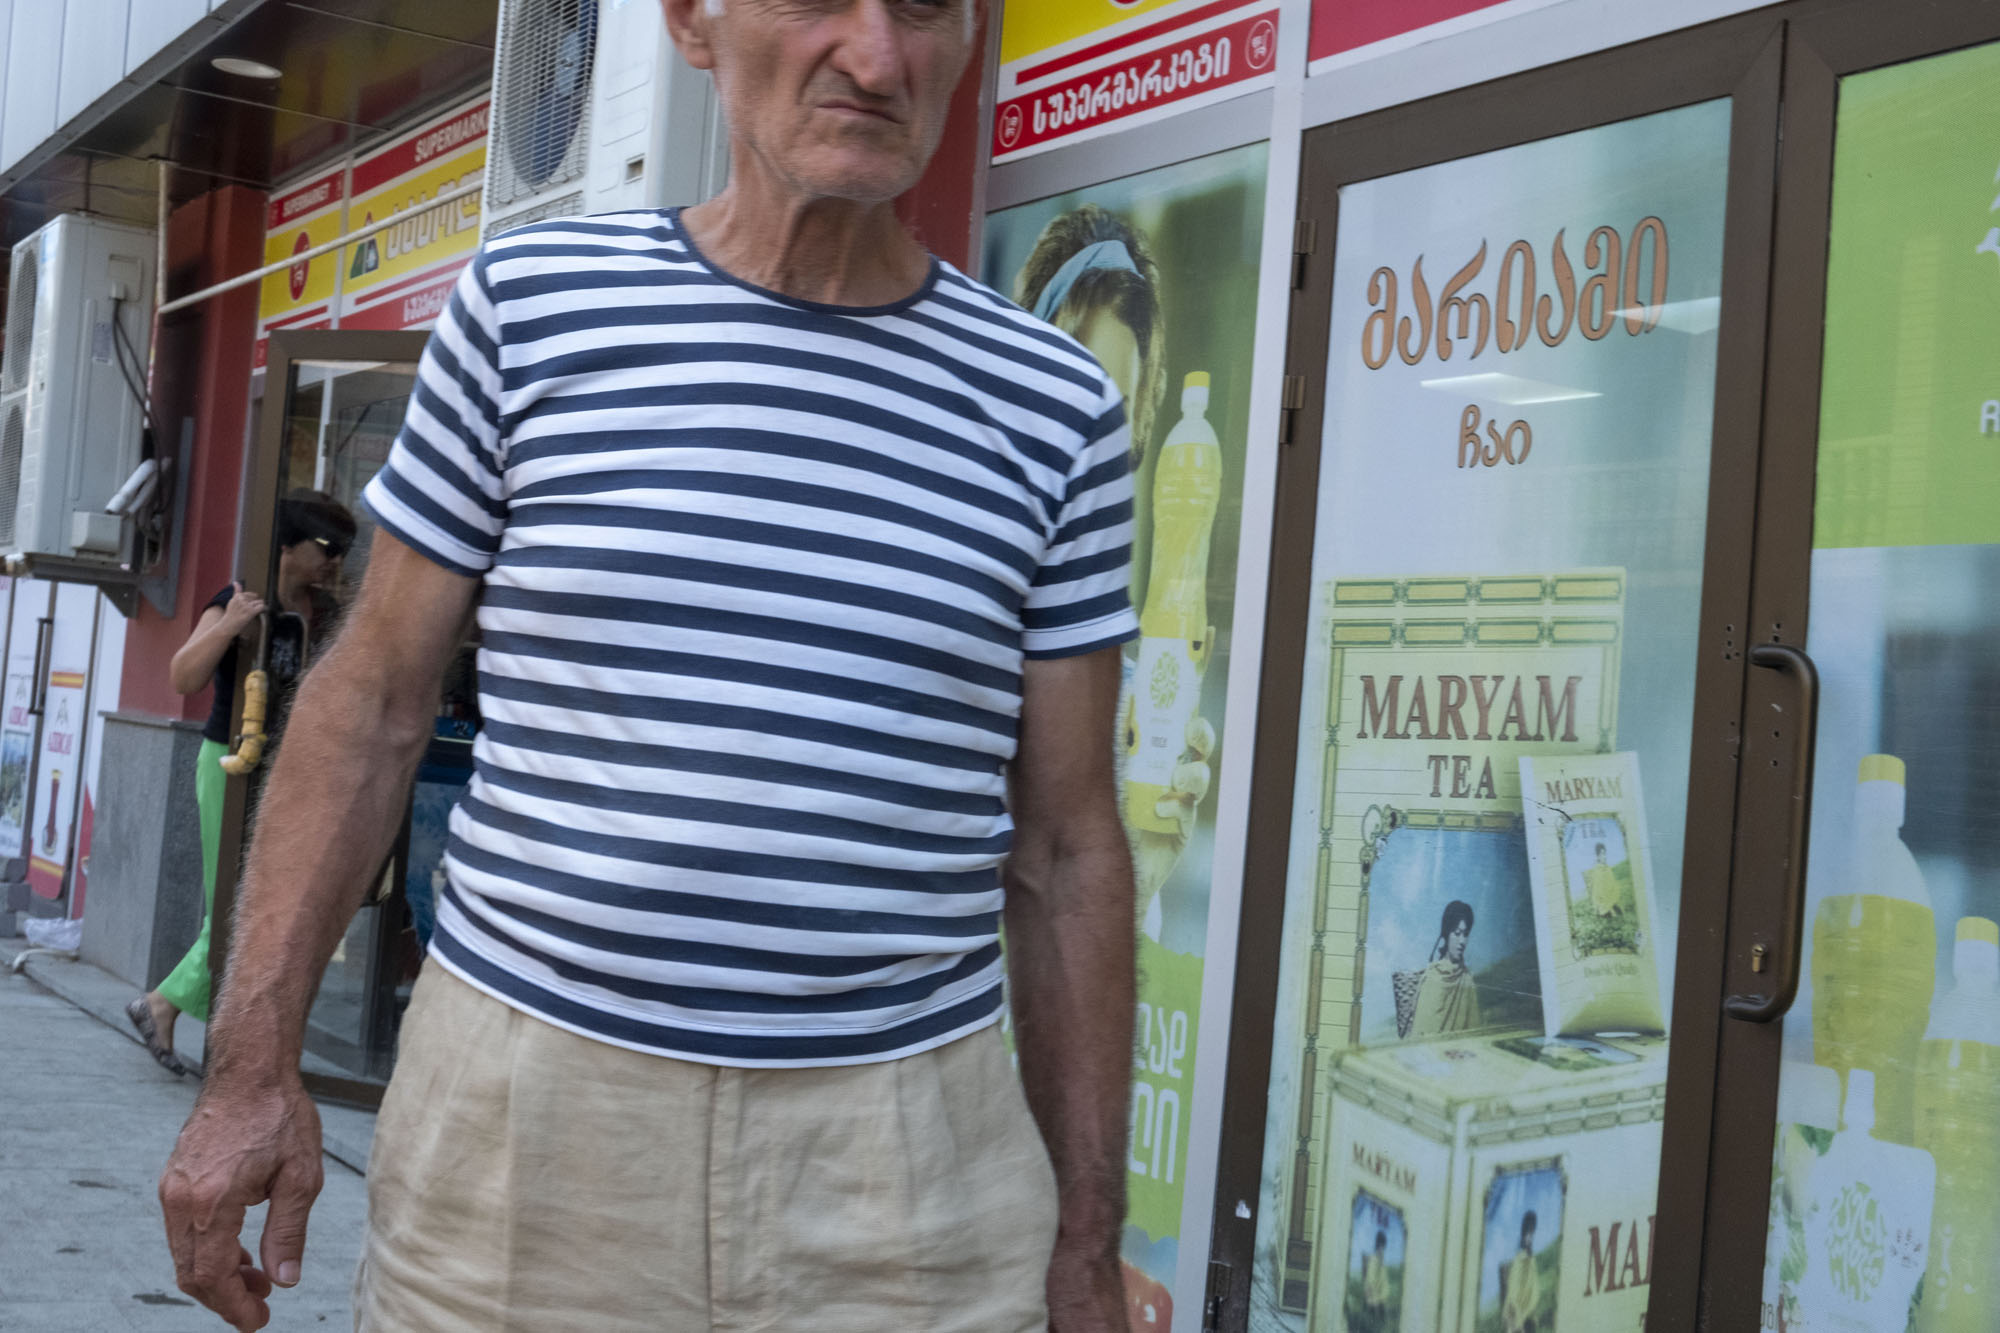 man in striped shirt.jpg